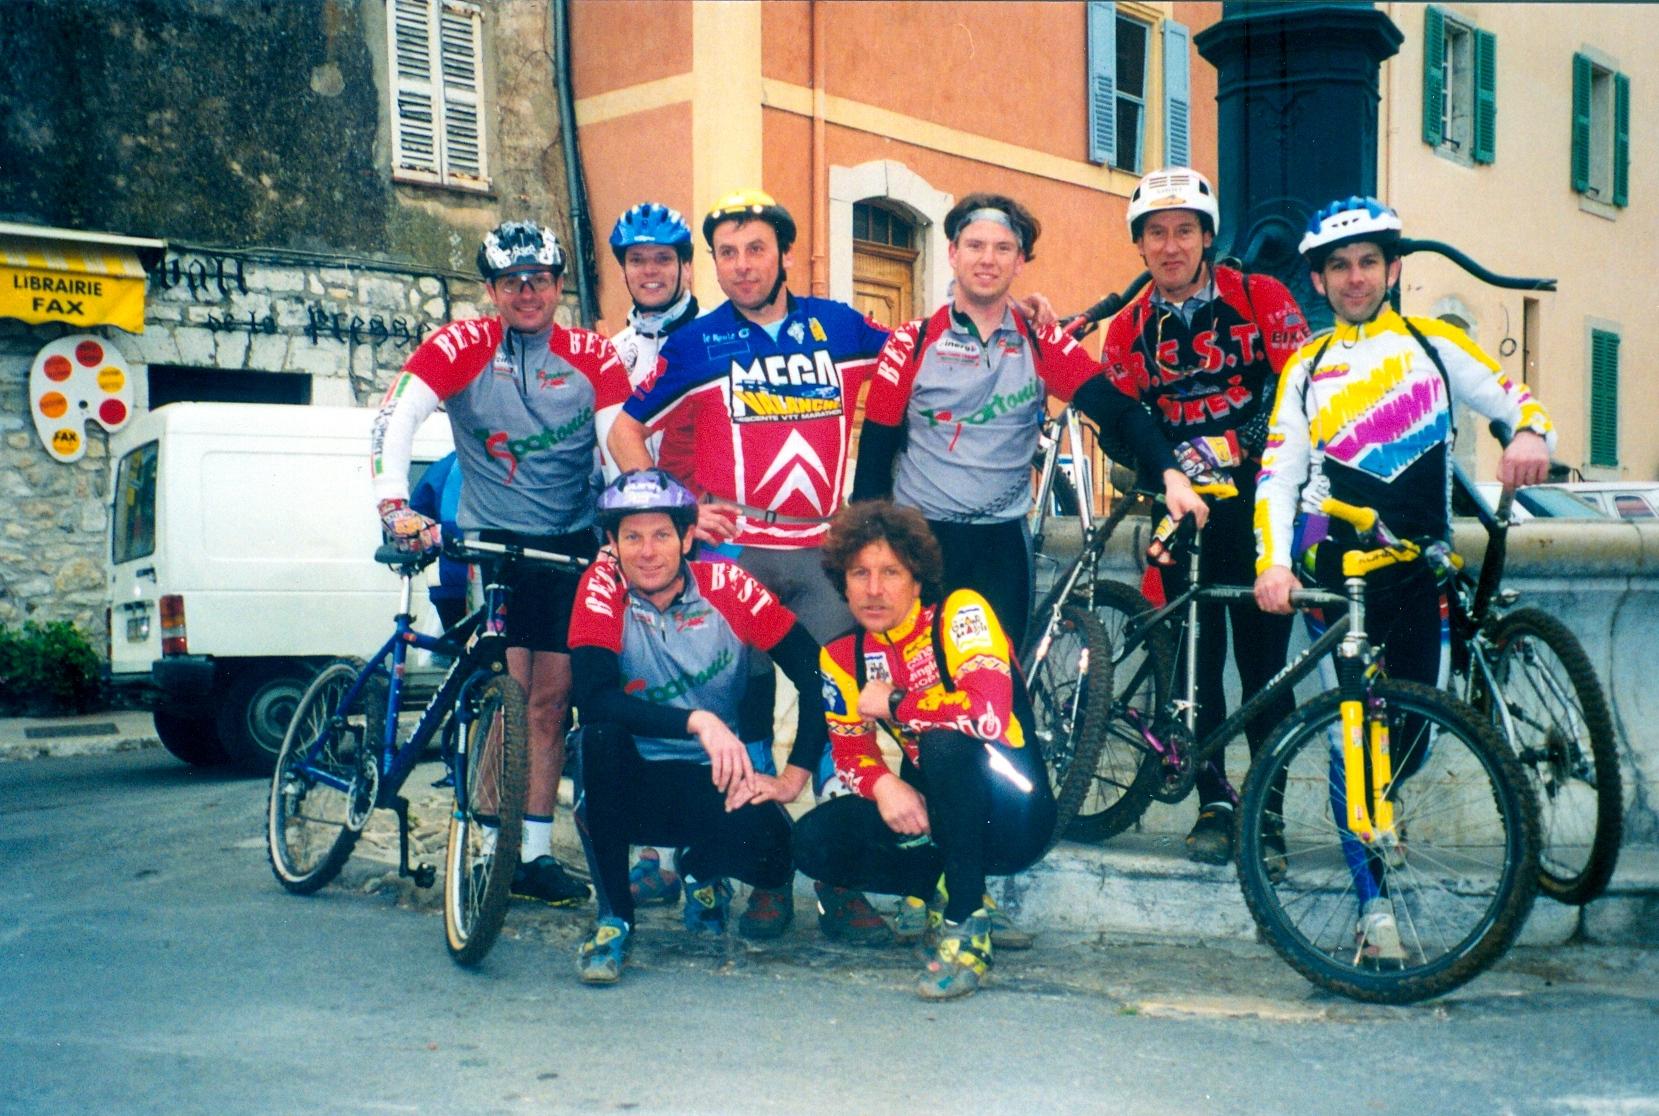 michel chevalier 1996 Reco Trans Utelle